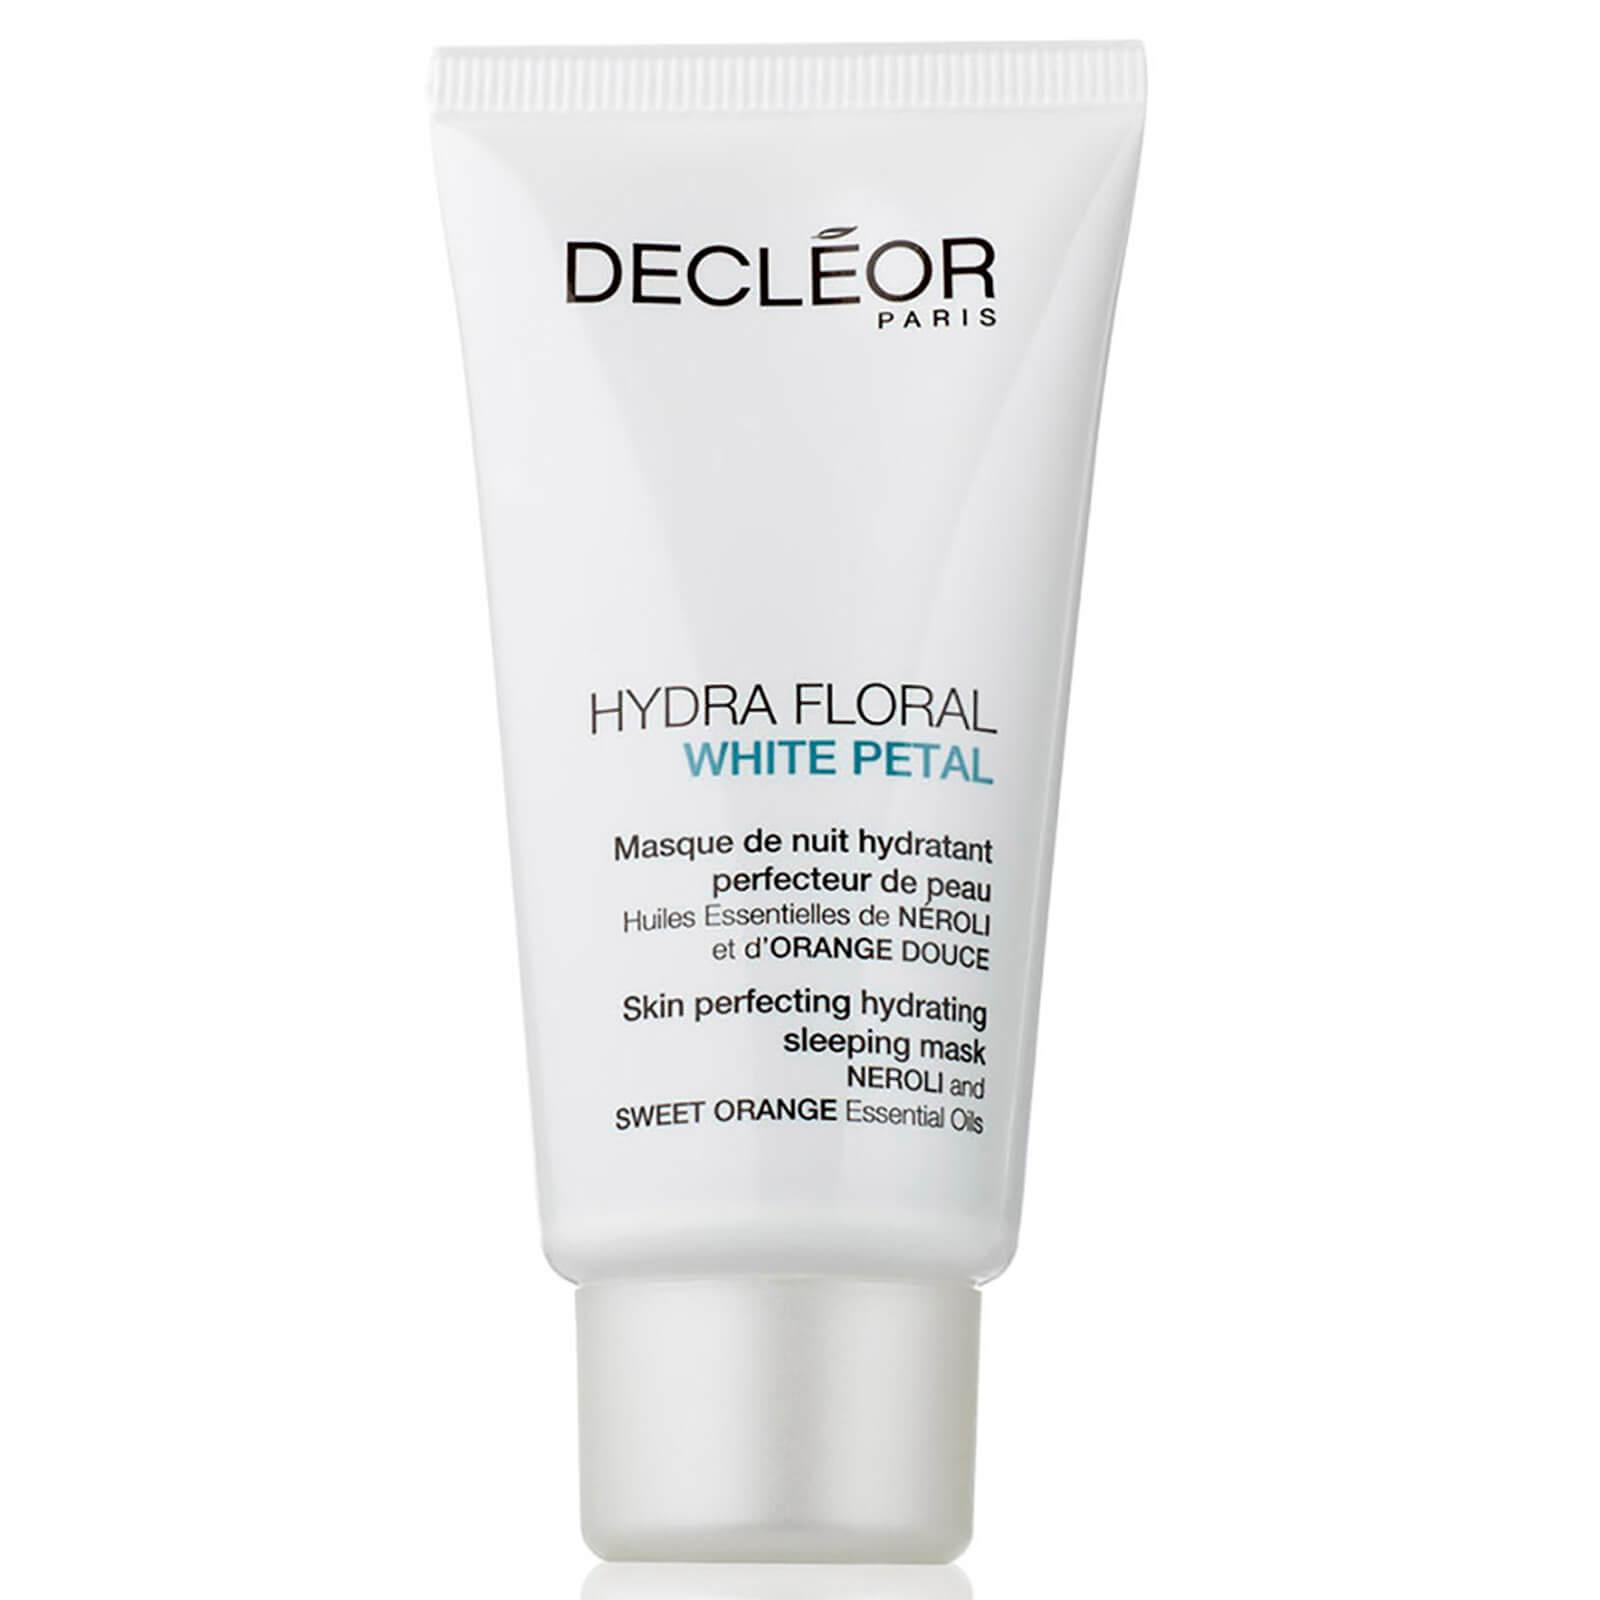 e0ced3ddd DECLÉOR Hydra Floral White Petal Skin Perfecting Hydrating Sleeping Mask